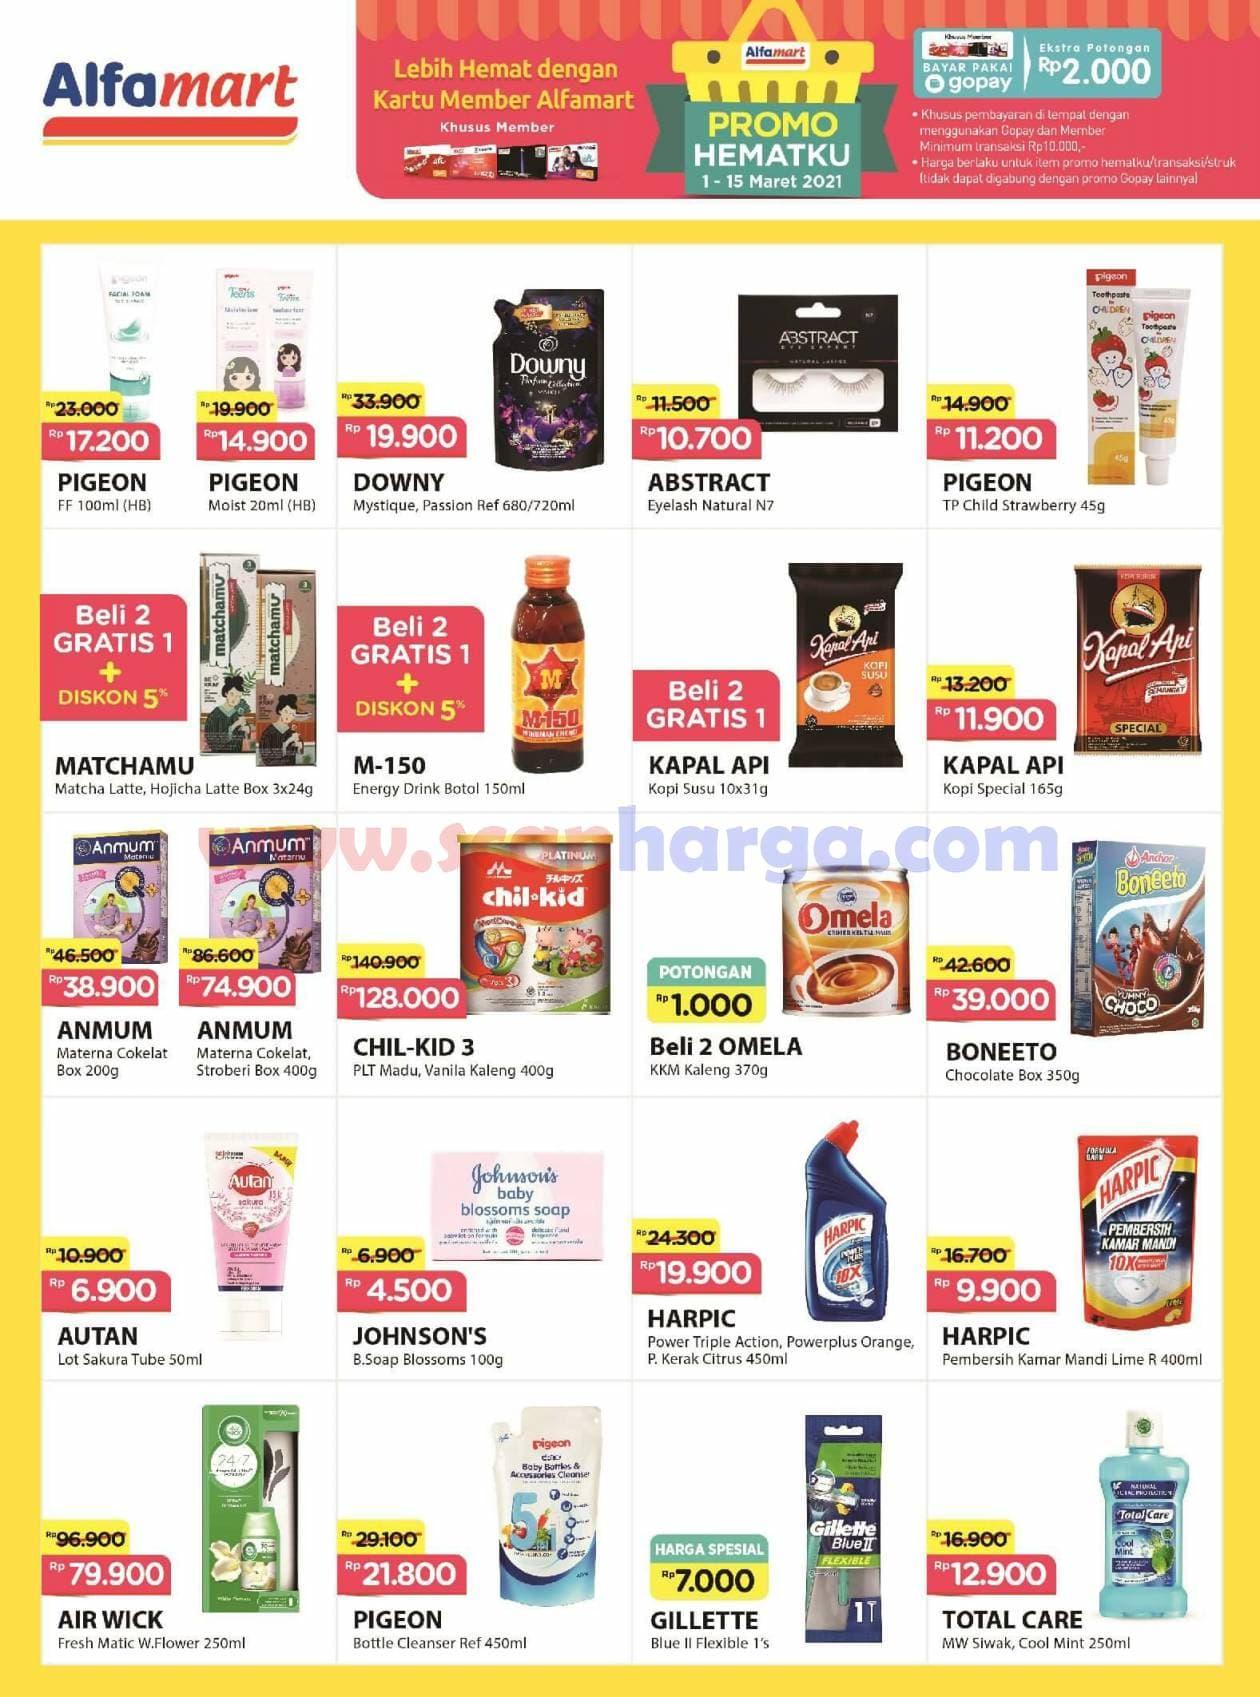 Katalog Promo Alfamart 1 - 15 Maret 2021 20